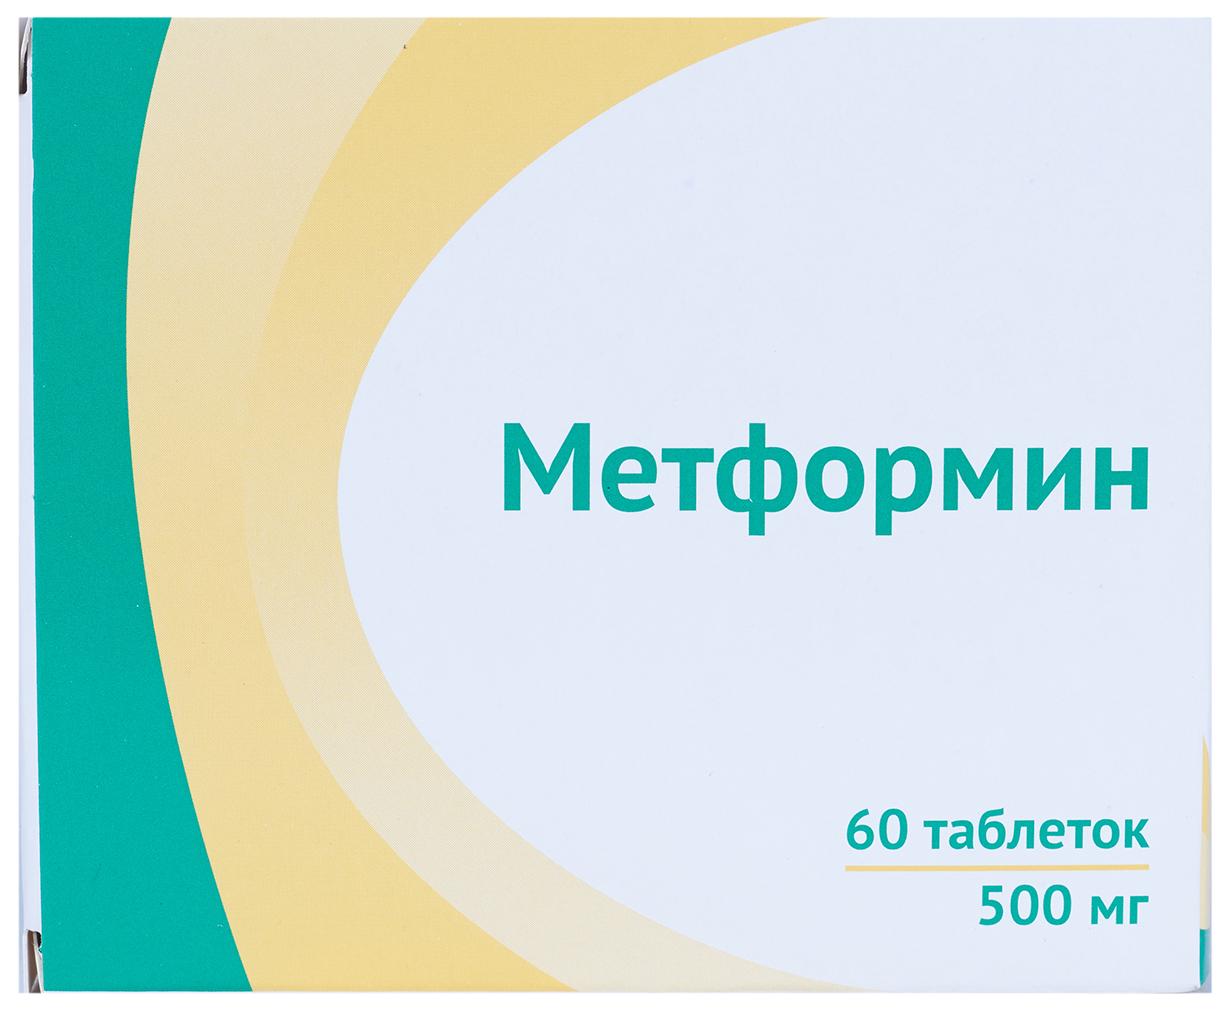 Купить Метформин таблетки 500 мг 60 шт., Озон ООО